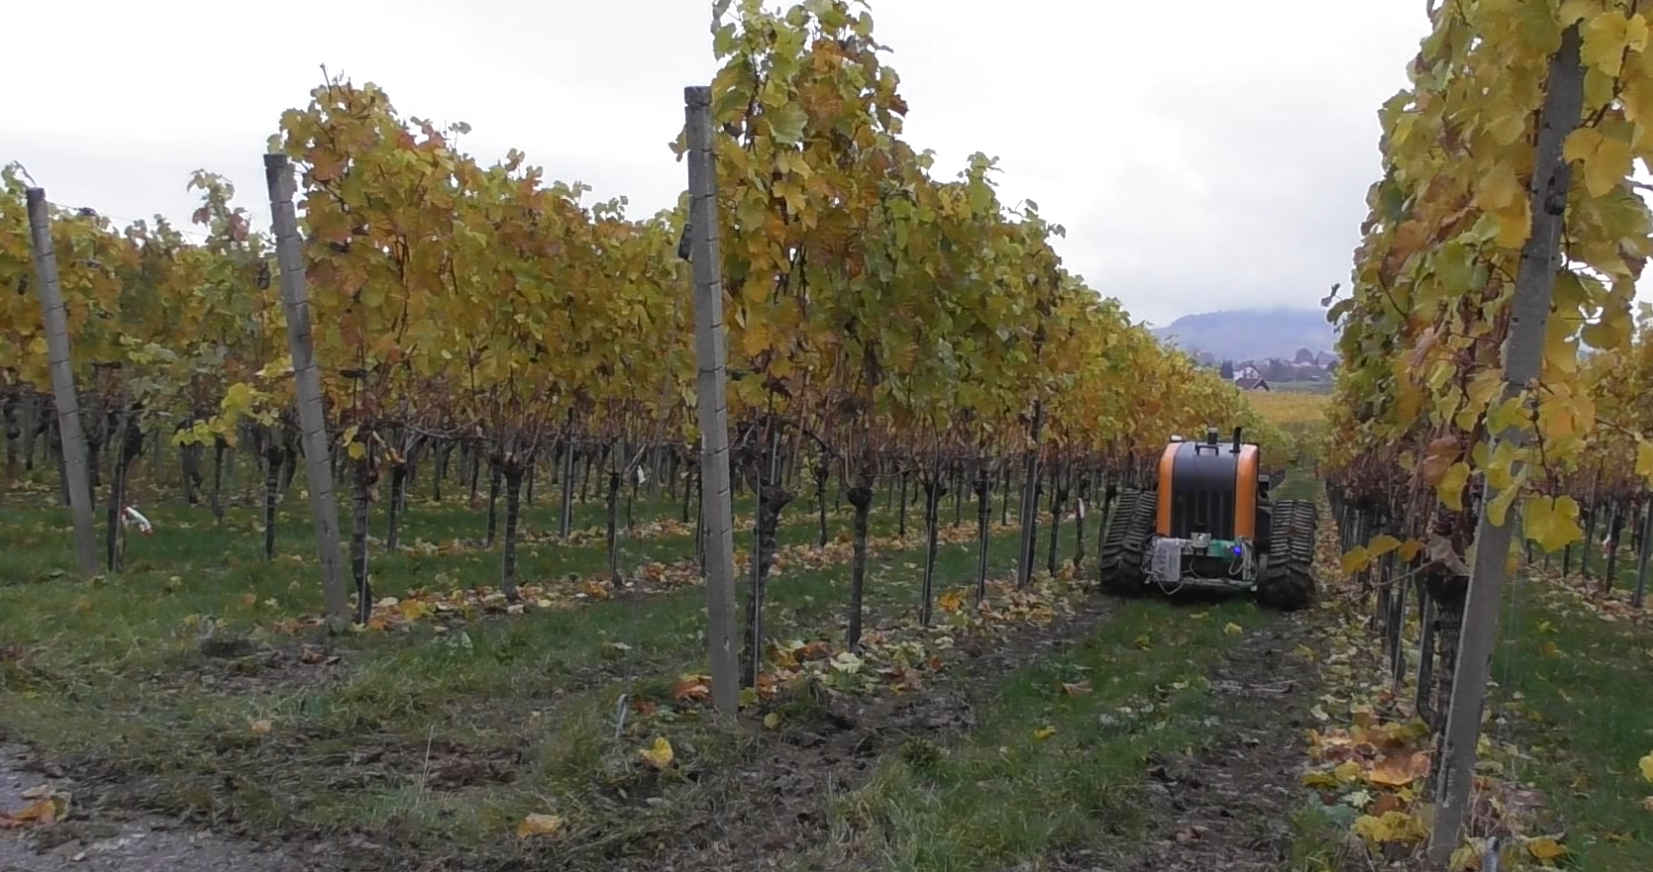 The vineyard crawler while working in a vineyard